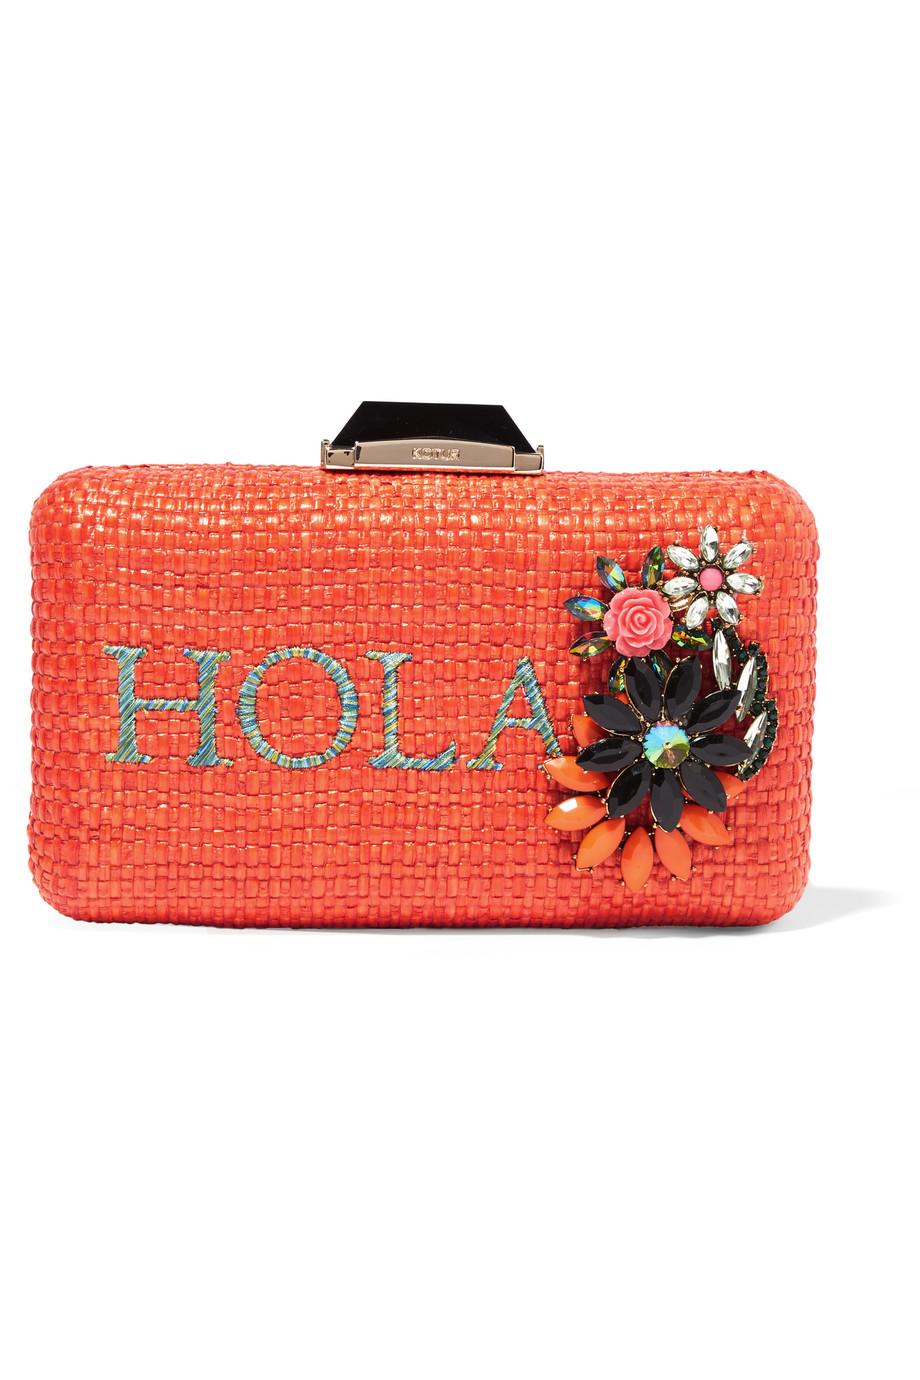 Kotur Hola Espey Embellished Raffia Box Clutch, Orange, Women's